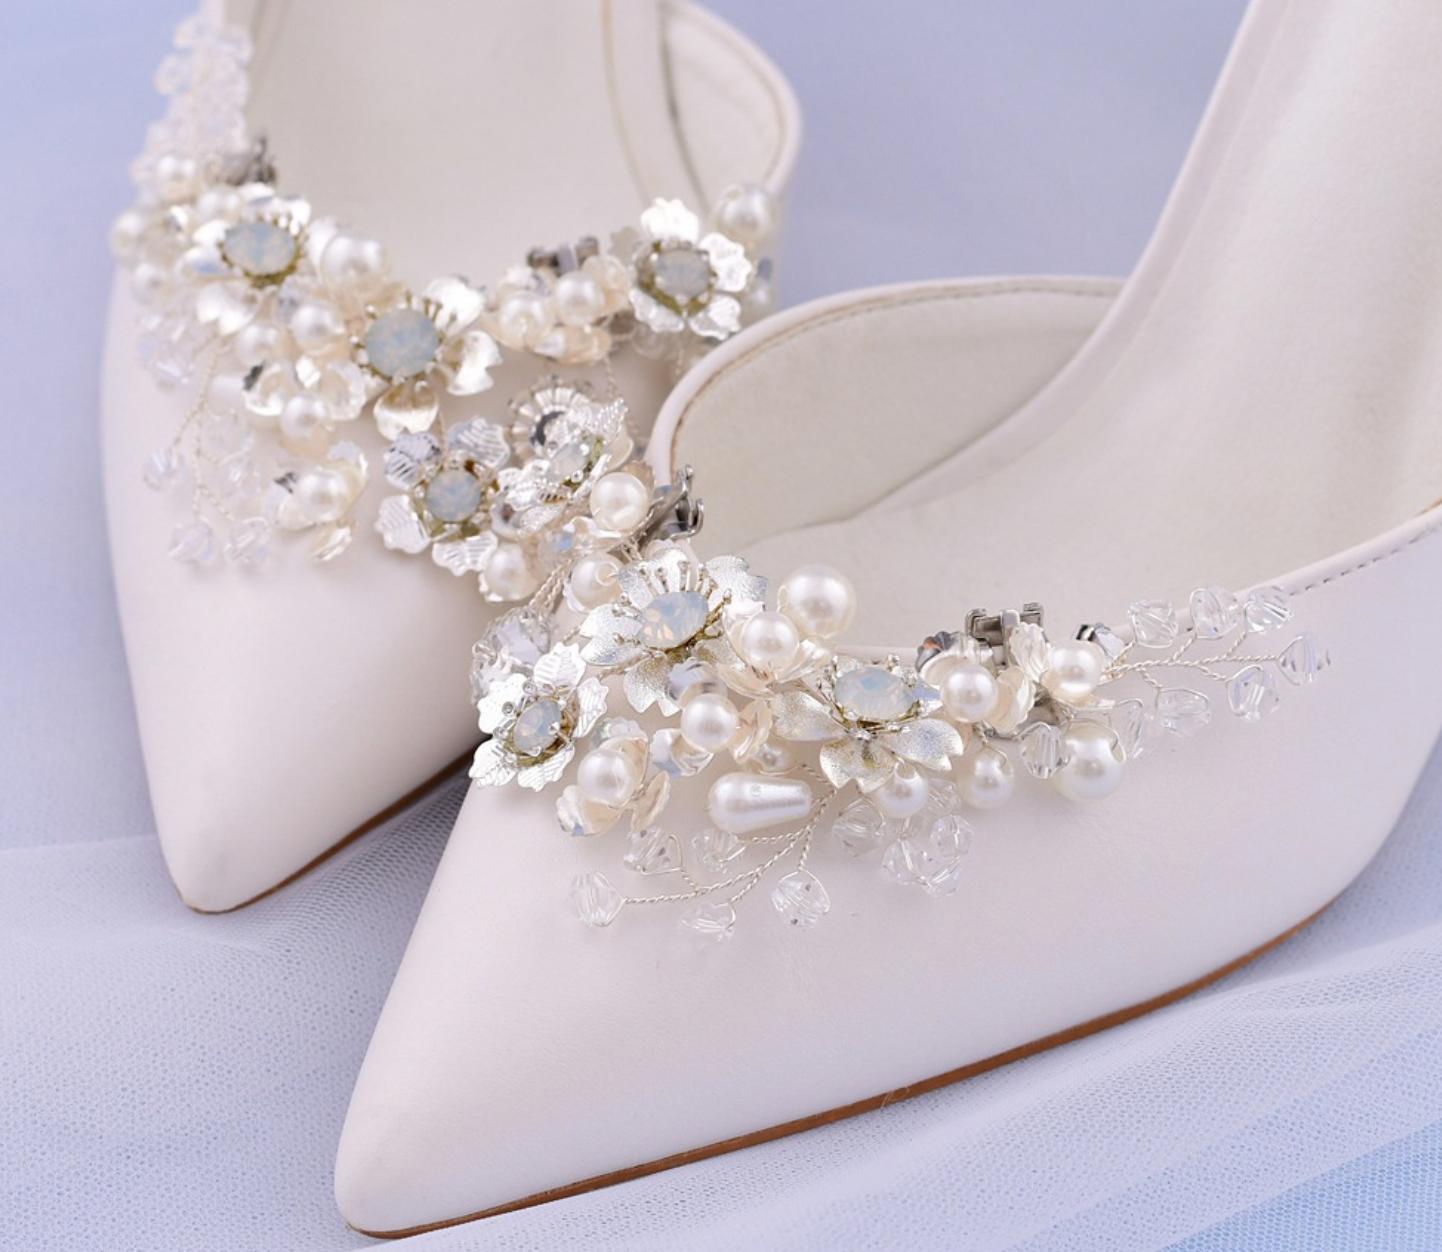 2 Pcs Fashion Rhinestone Crystal Pearl Silver Flower Shoe Clips Shoe Charms